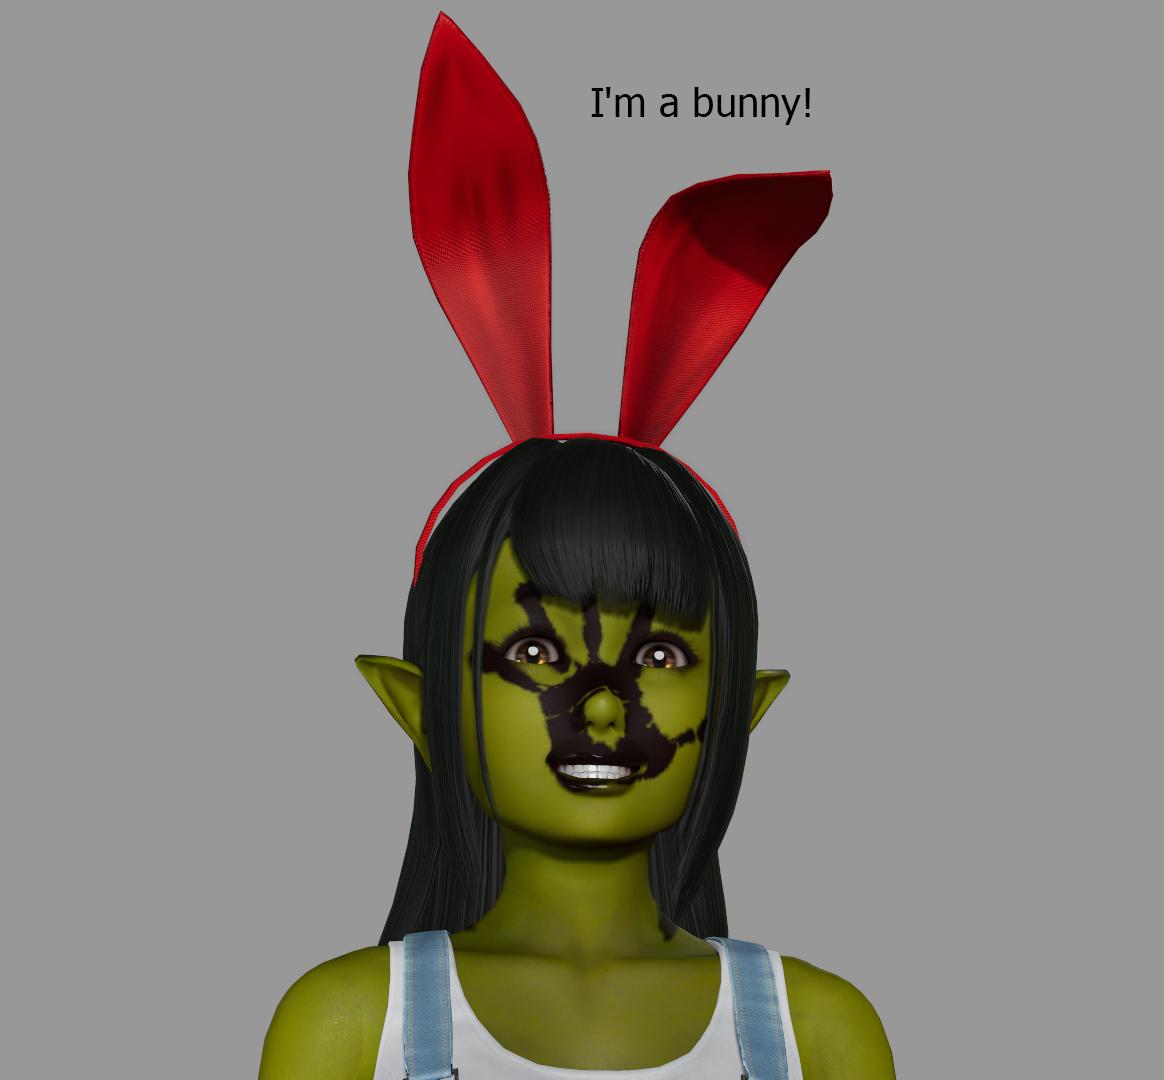 I'm a bunny!